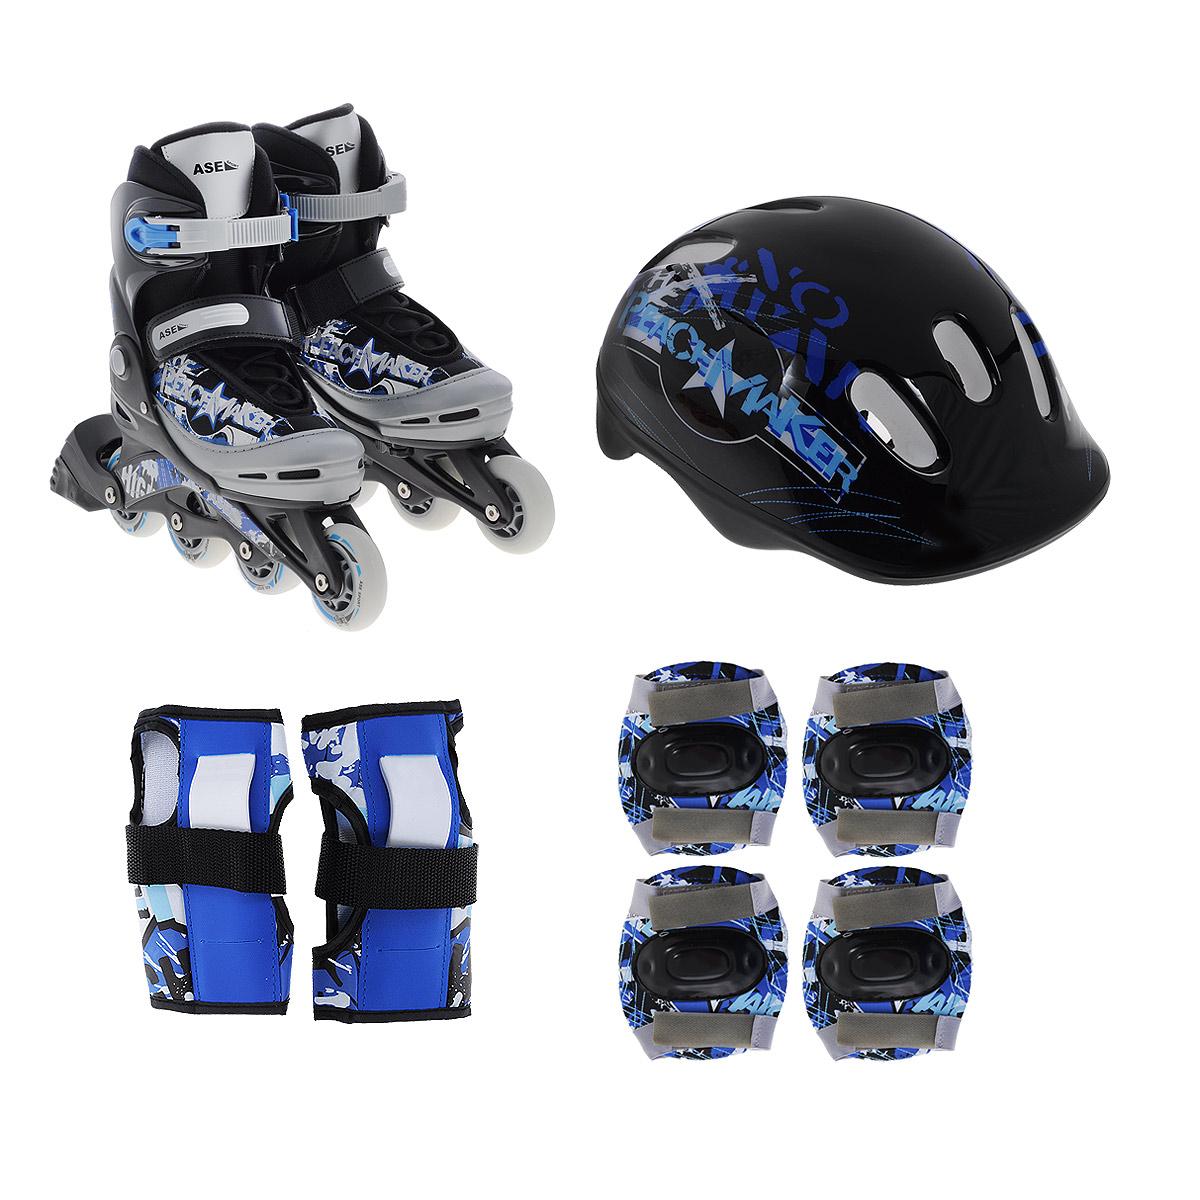 Комплект Ase-Sport Combo: коньки роликовые, шлем, защита, цвет: синий. ASE-617M. Размер S (30/33) COMBO ASE-617M